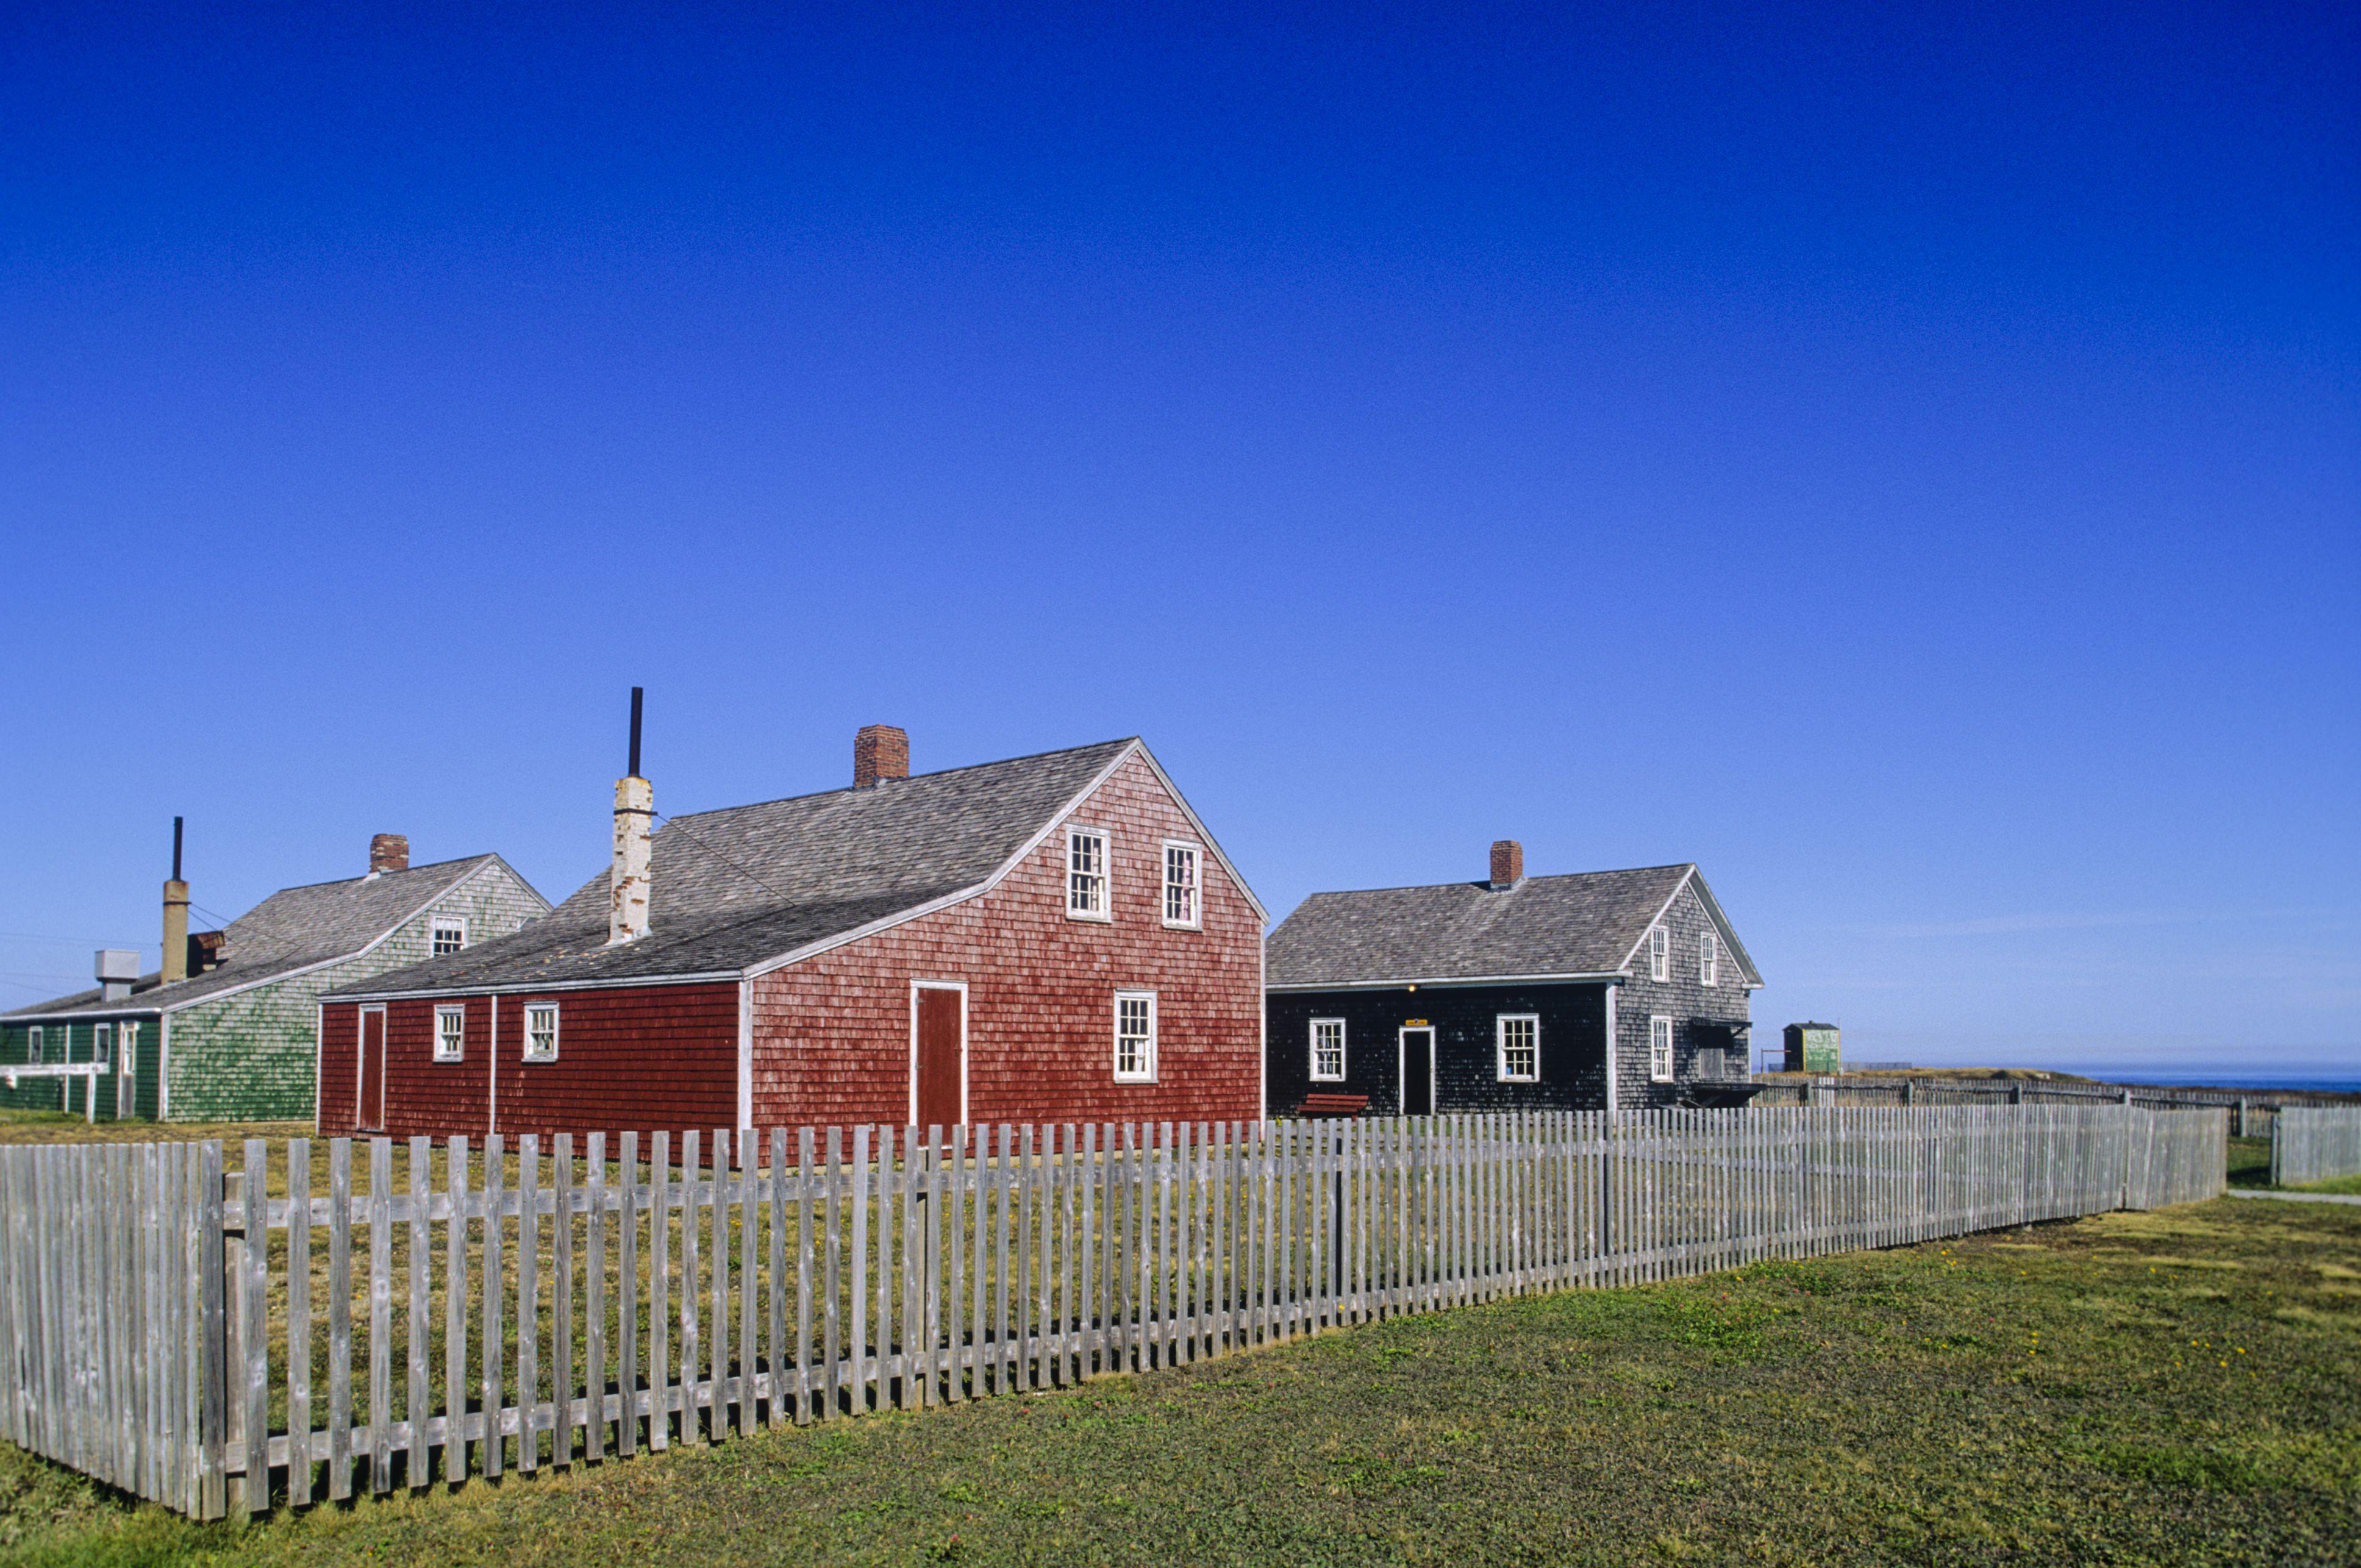 Company houses, Miner's Museum, Glace Bay, Cape Breton, Nova Scotia, Canada